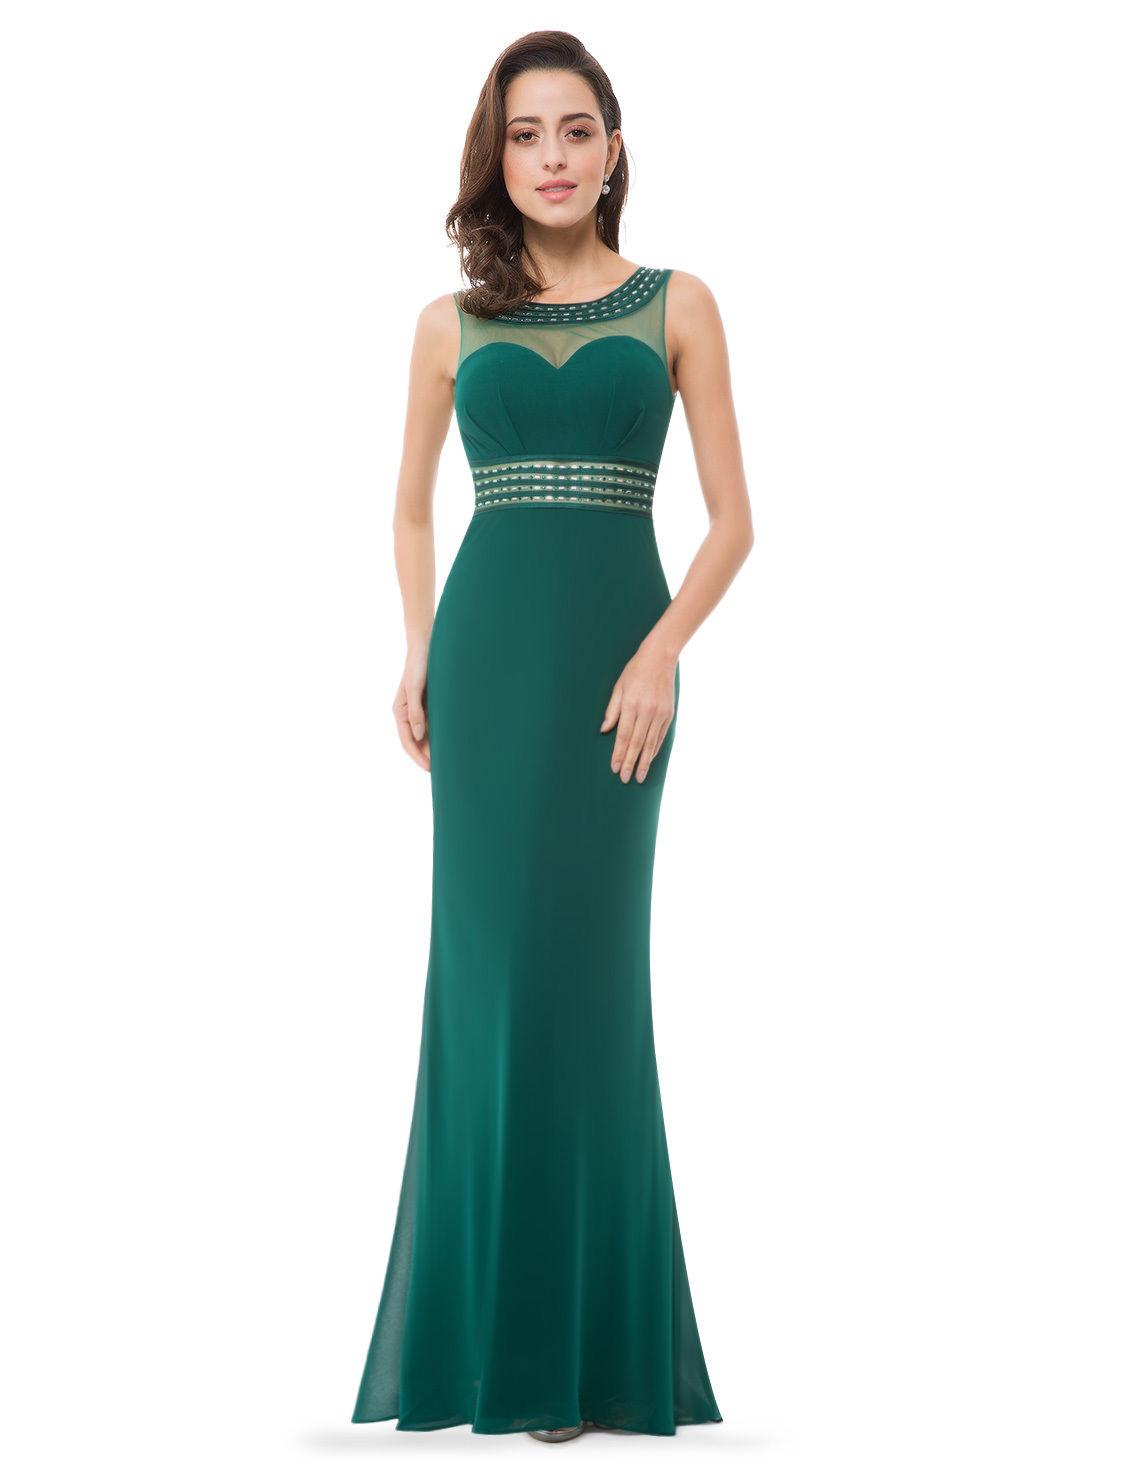 Zelené šaty na svatbu ples  cb3837937f